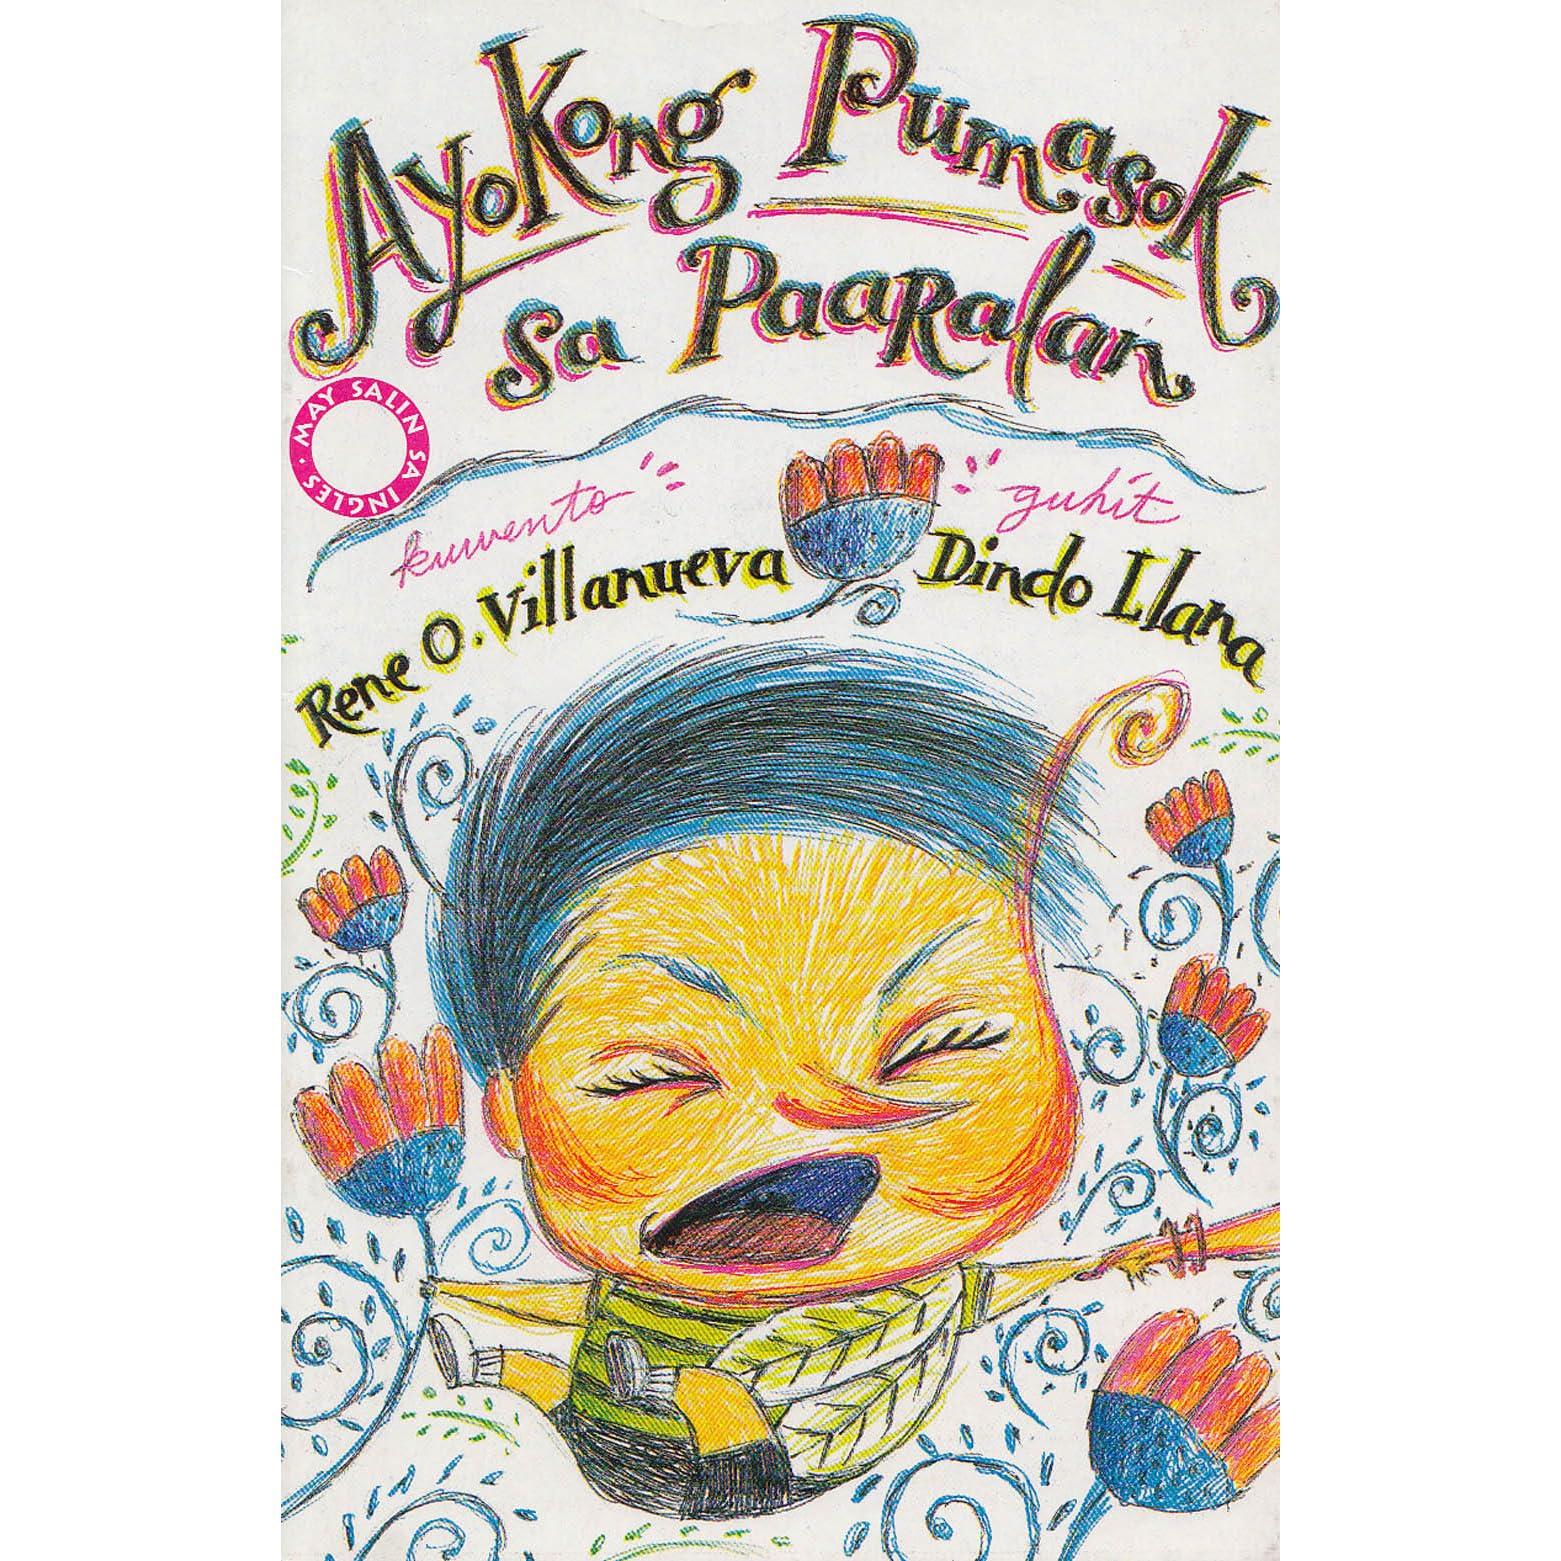 Ayokong Pumasok Sa Paaralan by Rene O  Villanueva